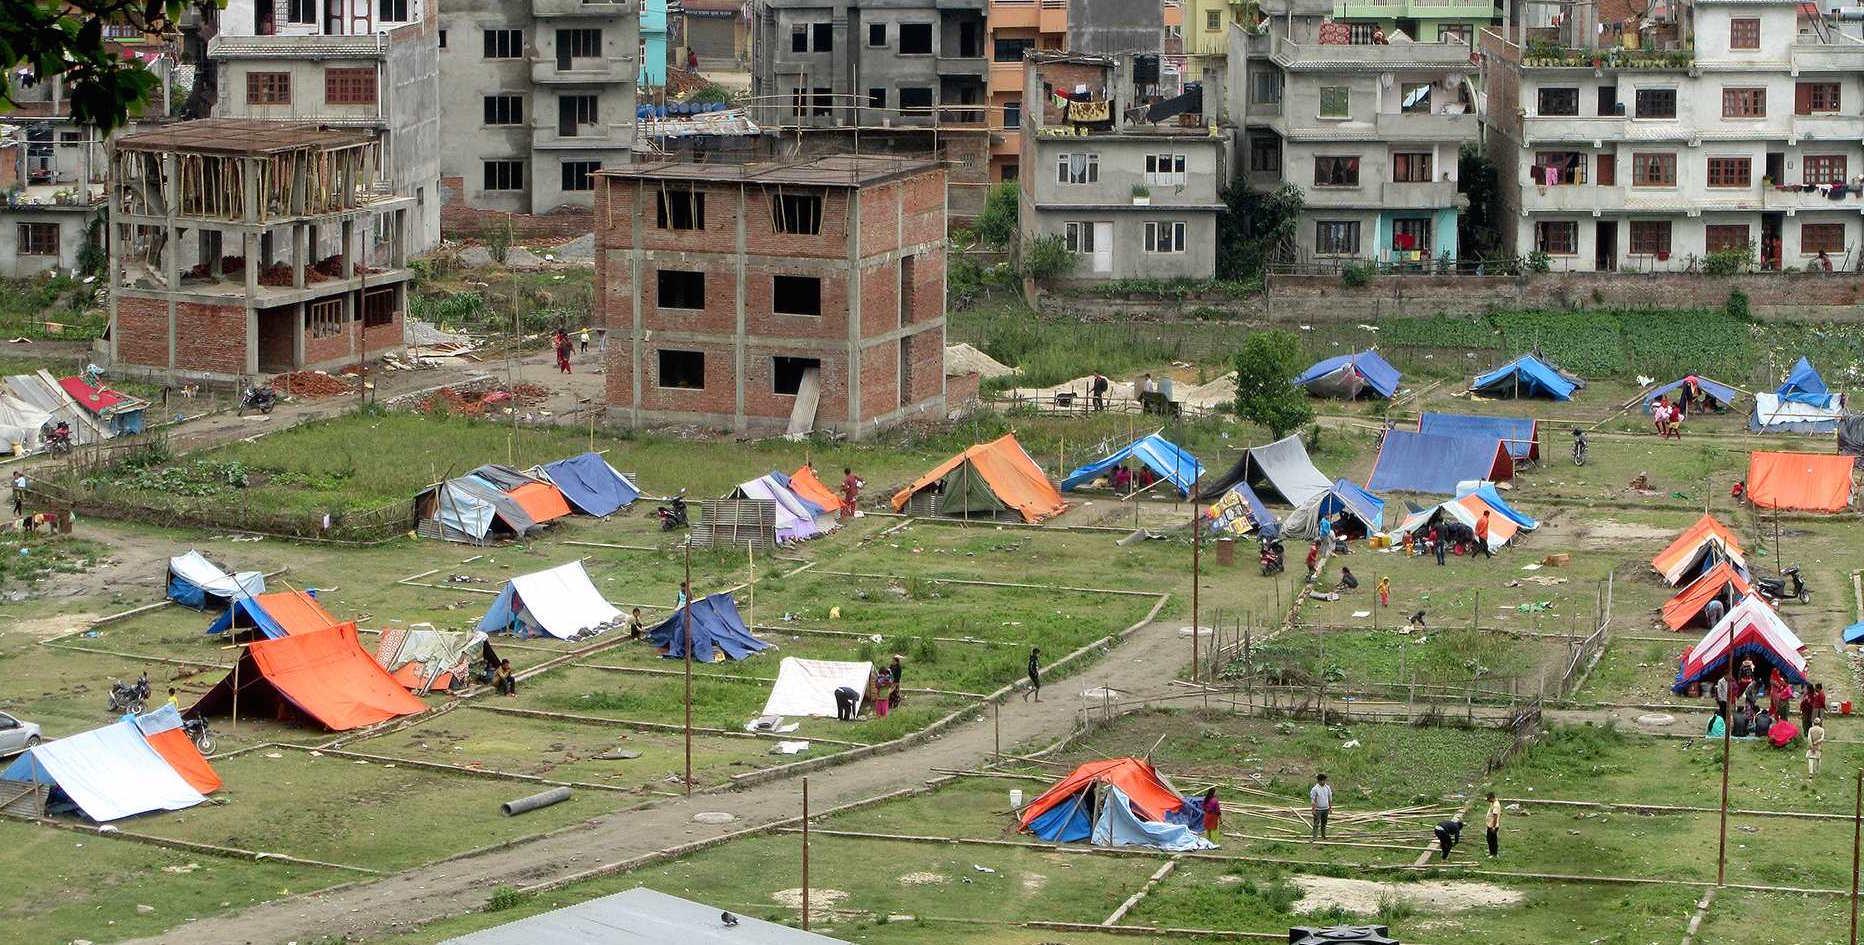 Photo-2-tents.jpg